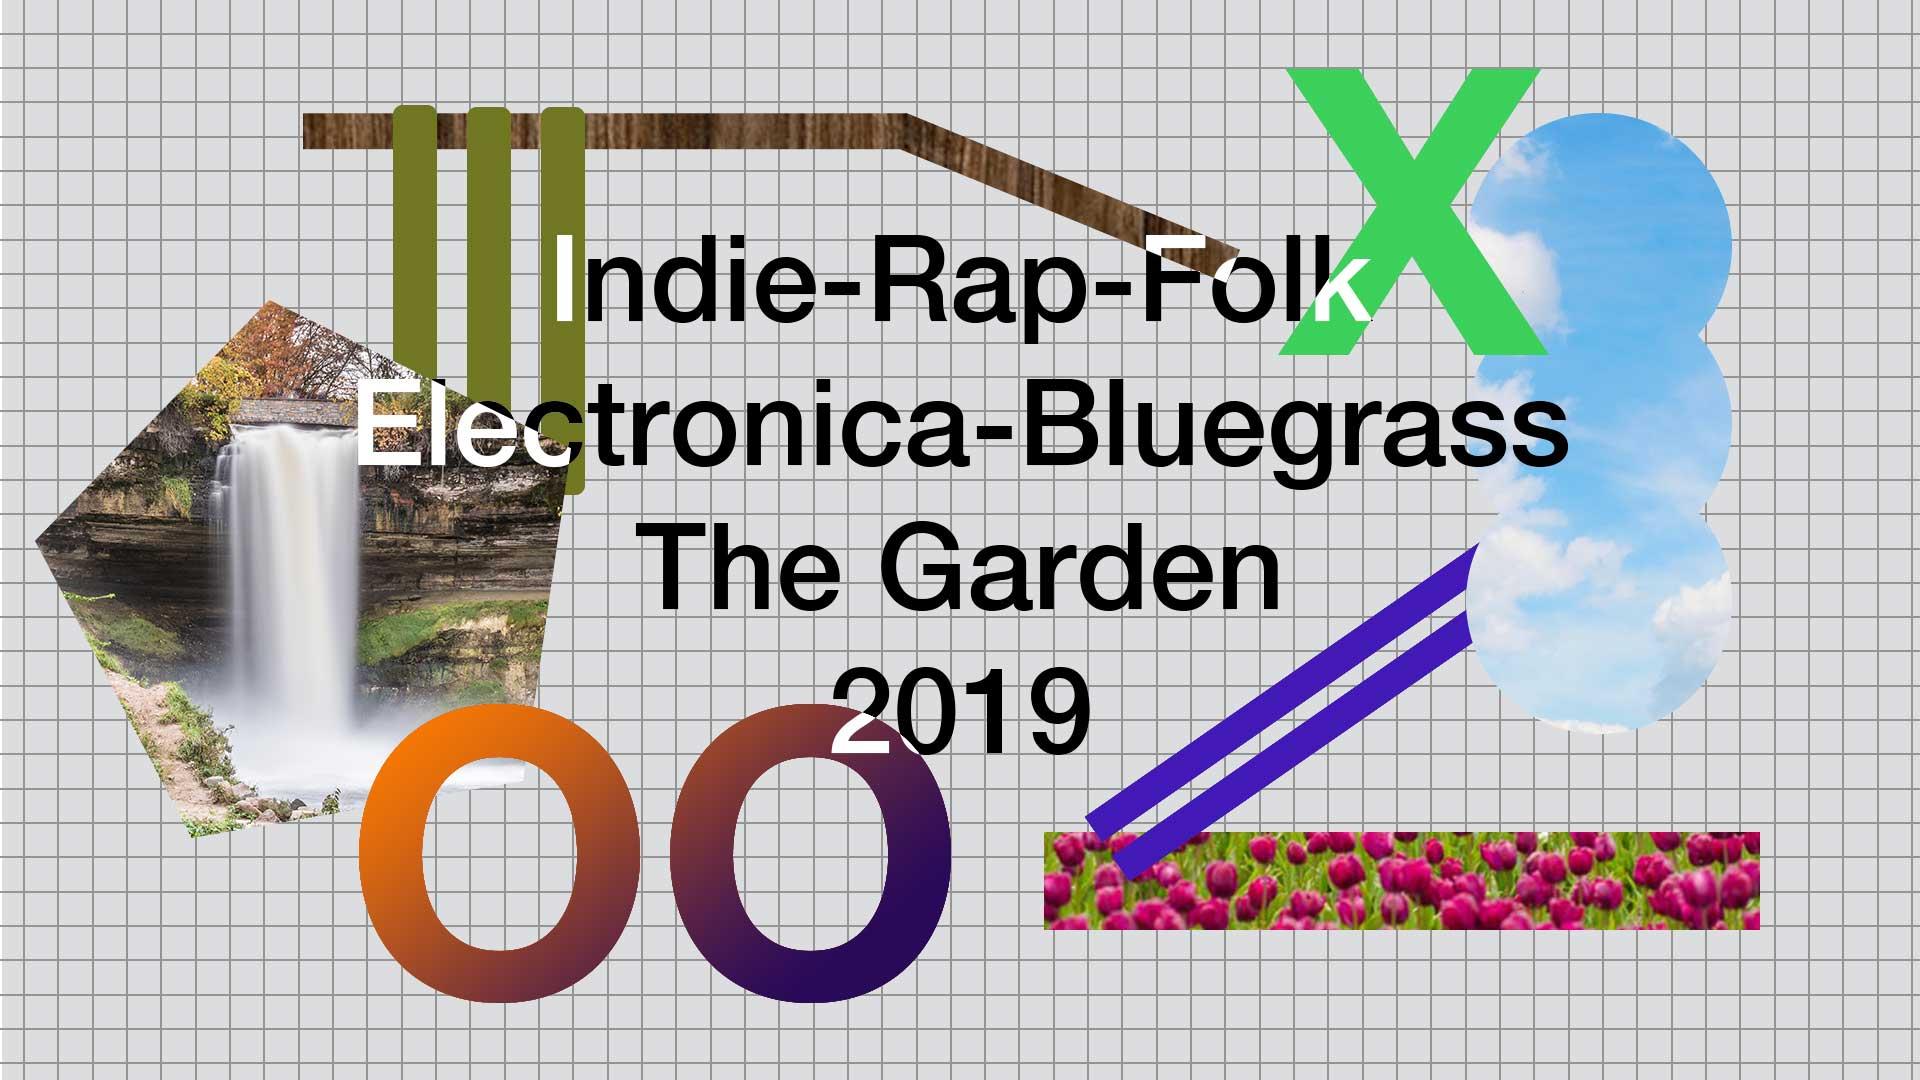 Rock-The-Garden-changes-name-to-Indie-Rap-Folk-Electronica-Bluegrass-The-Garden.jpg